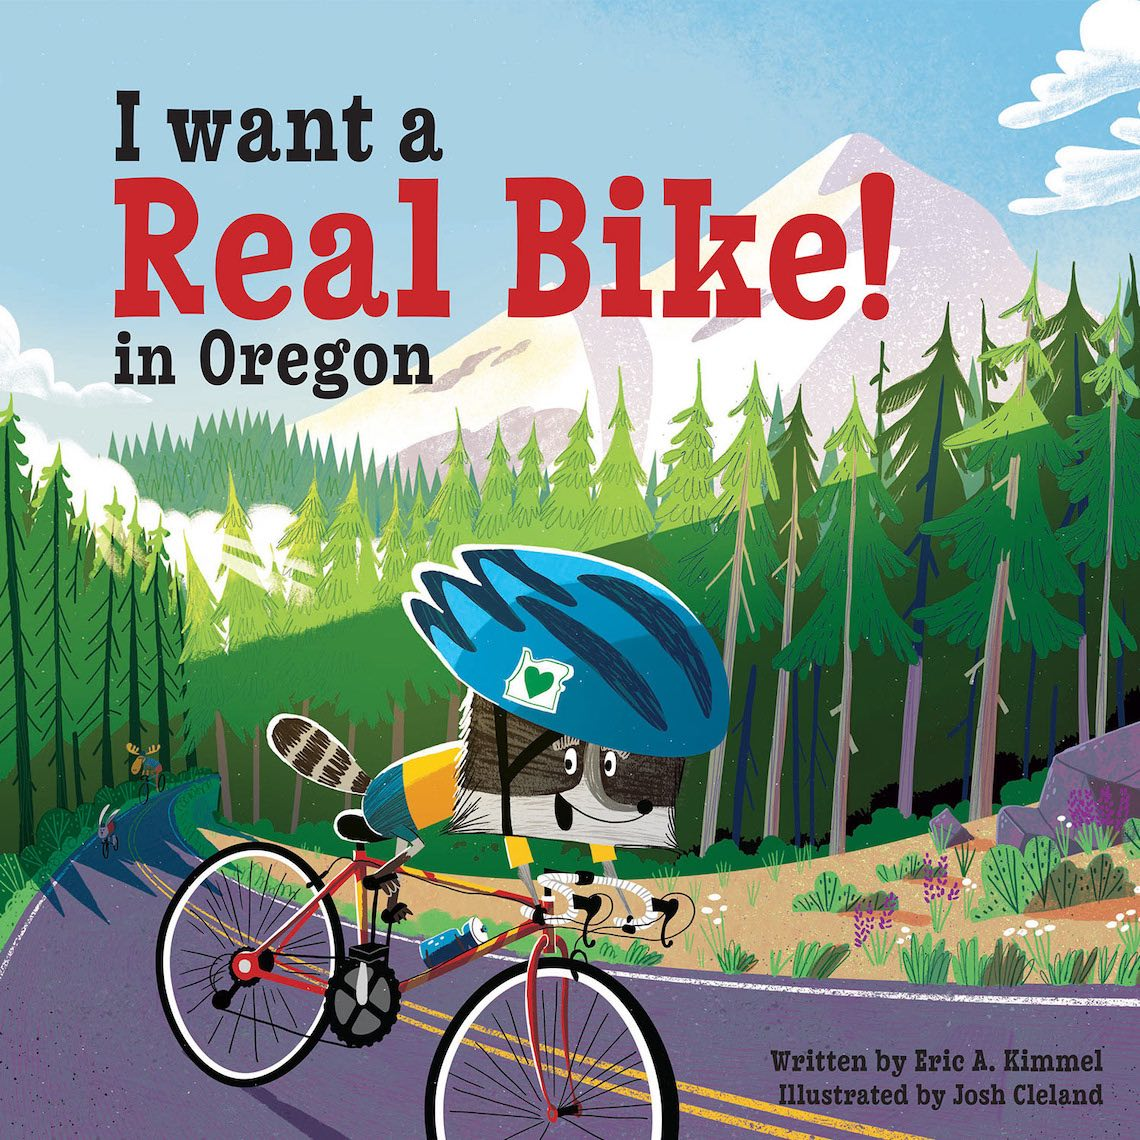 I Want a Real Bike in Oregon_Josh Cleland_illustration